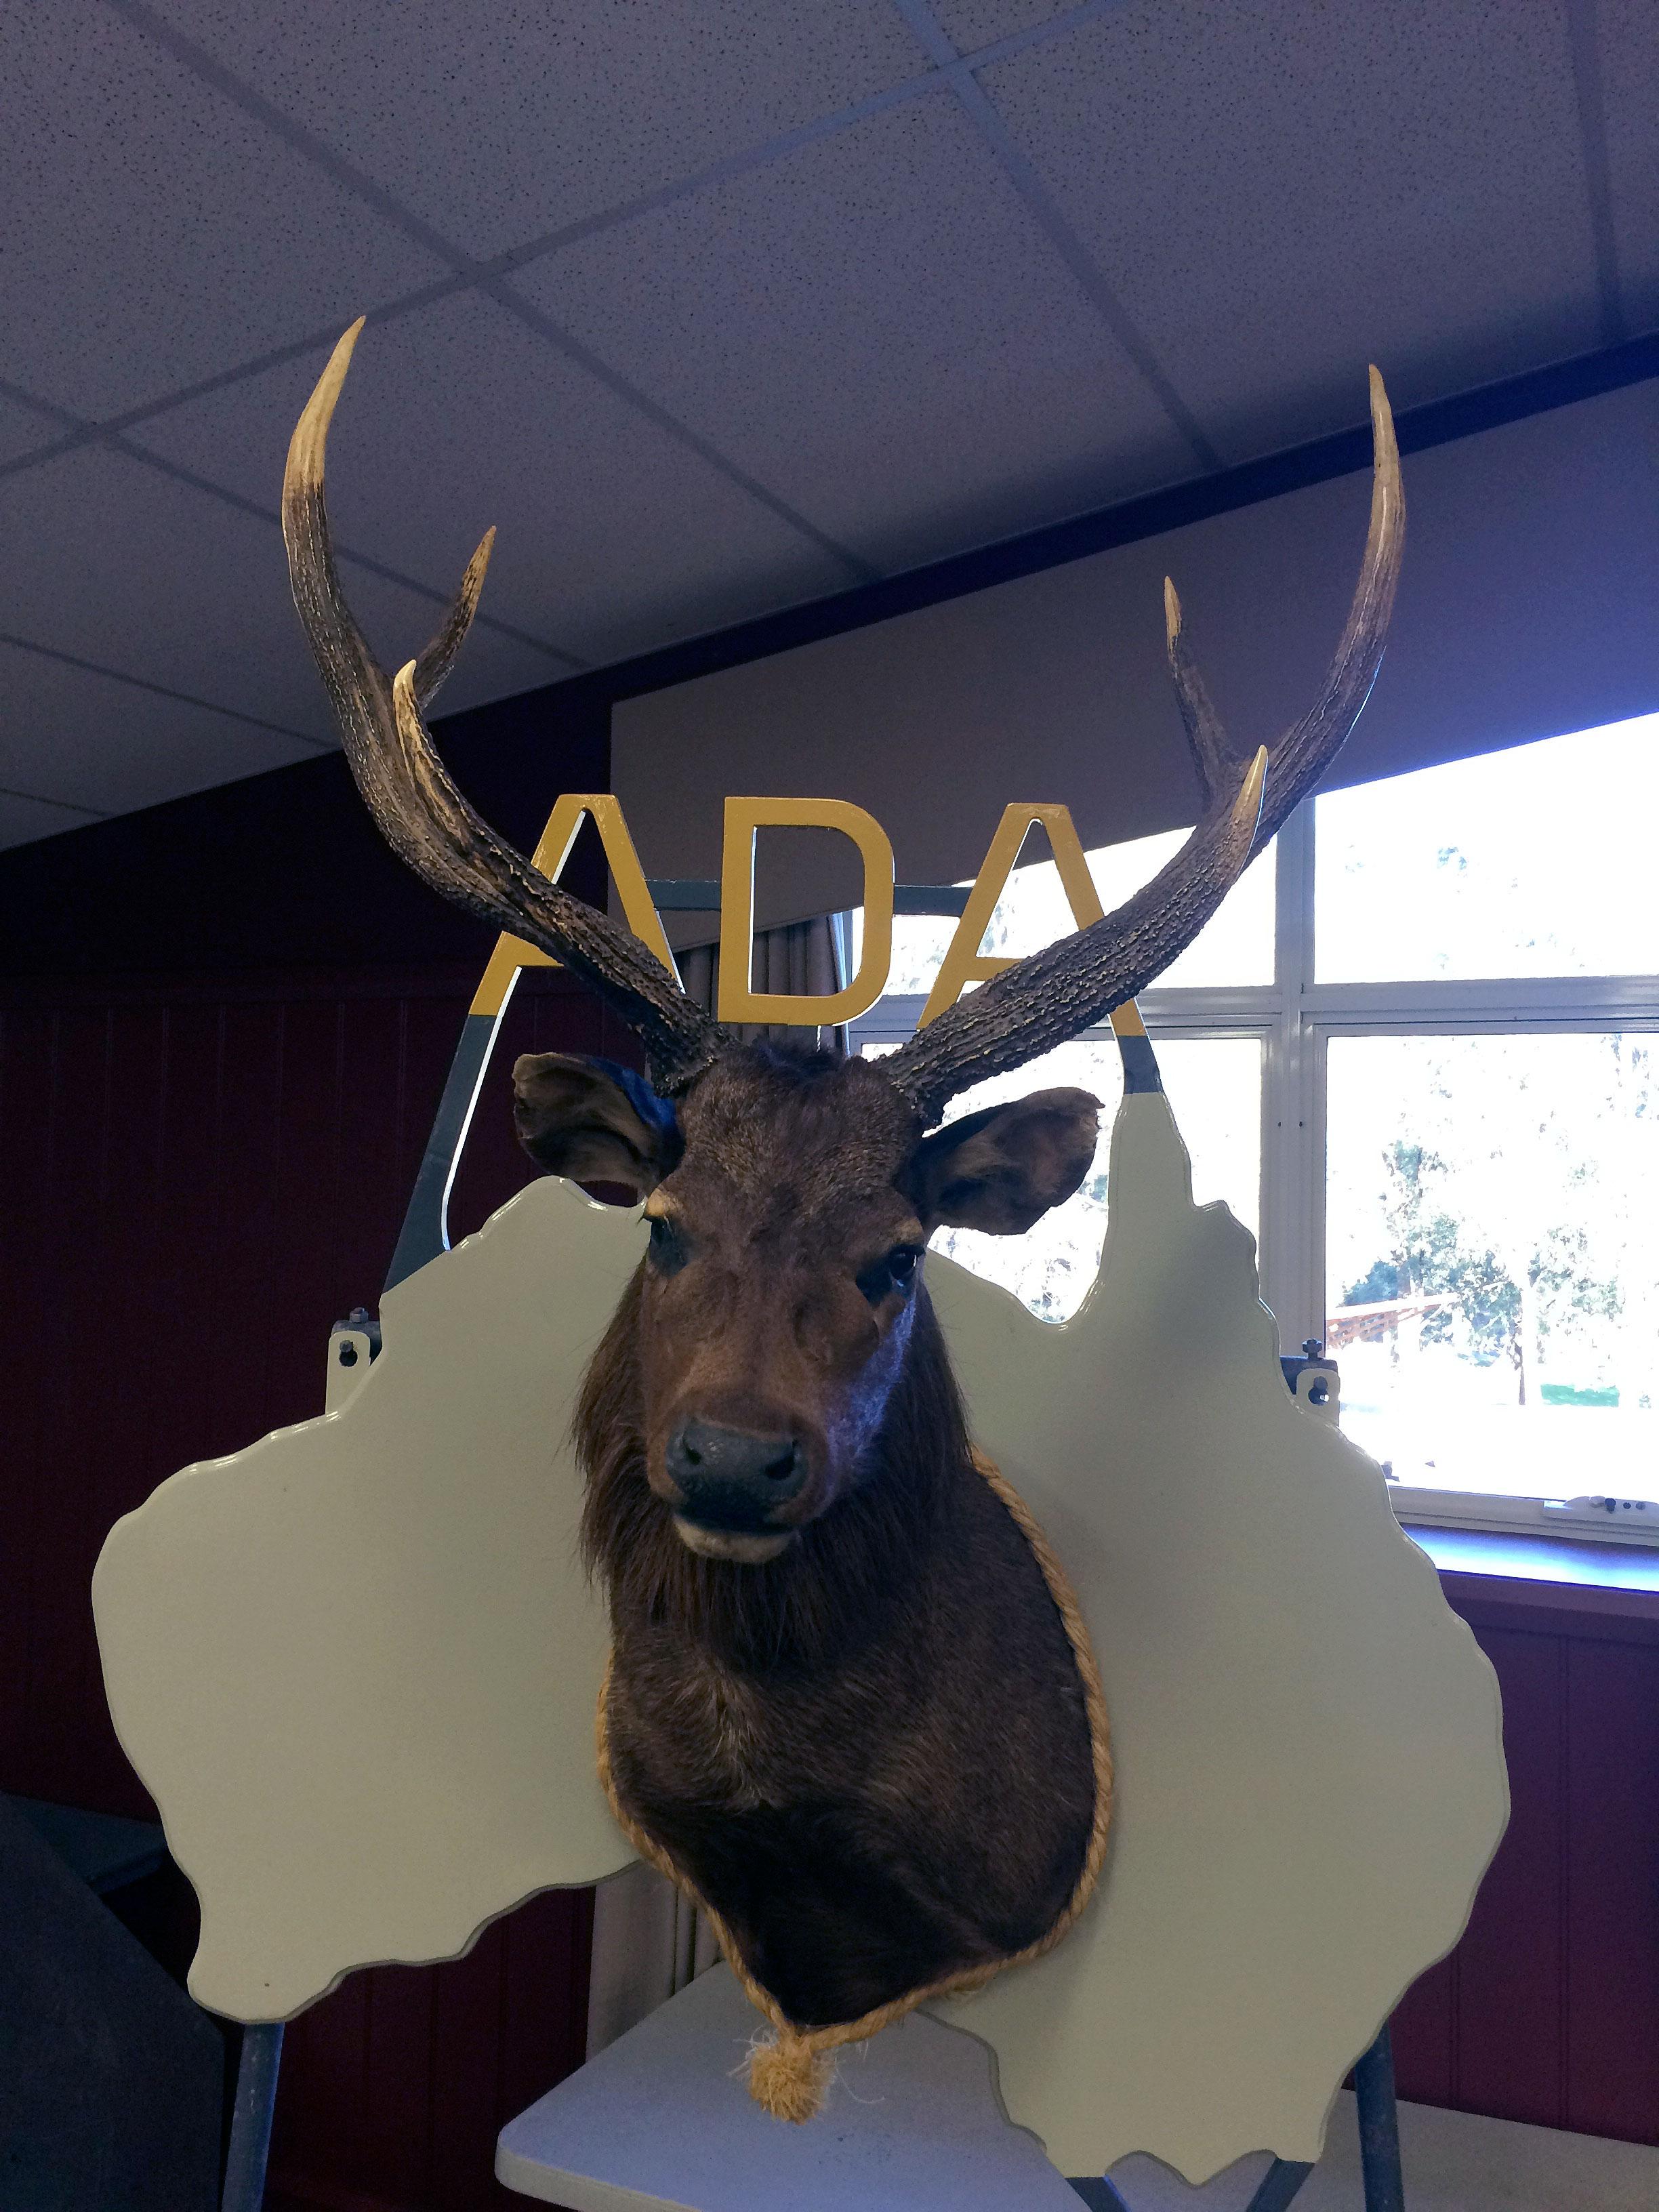 ADA forest edge 2016